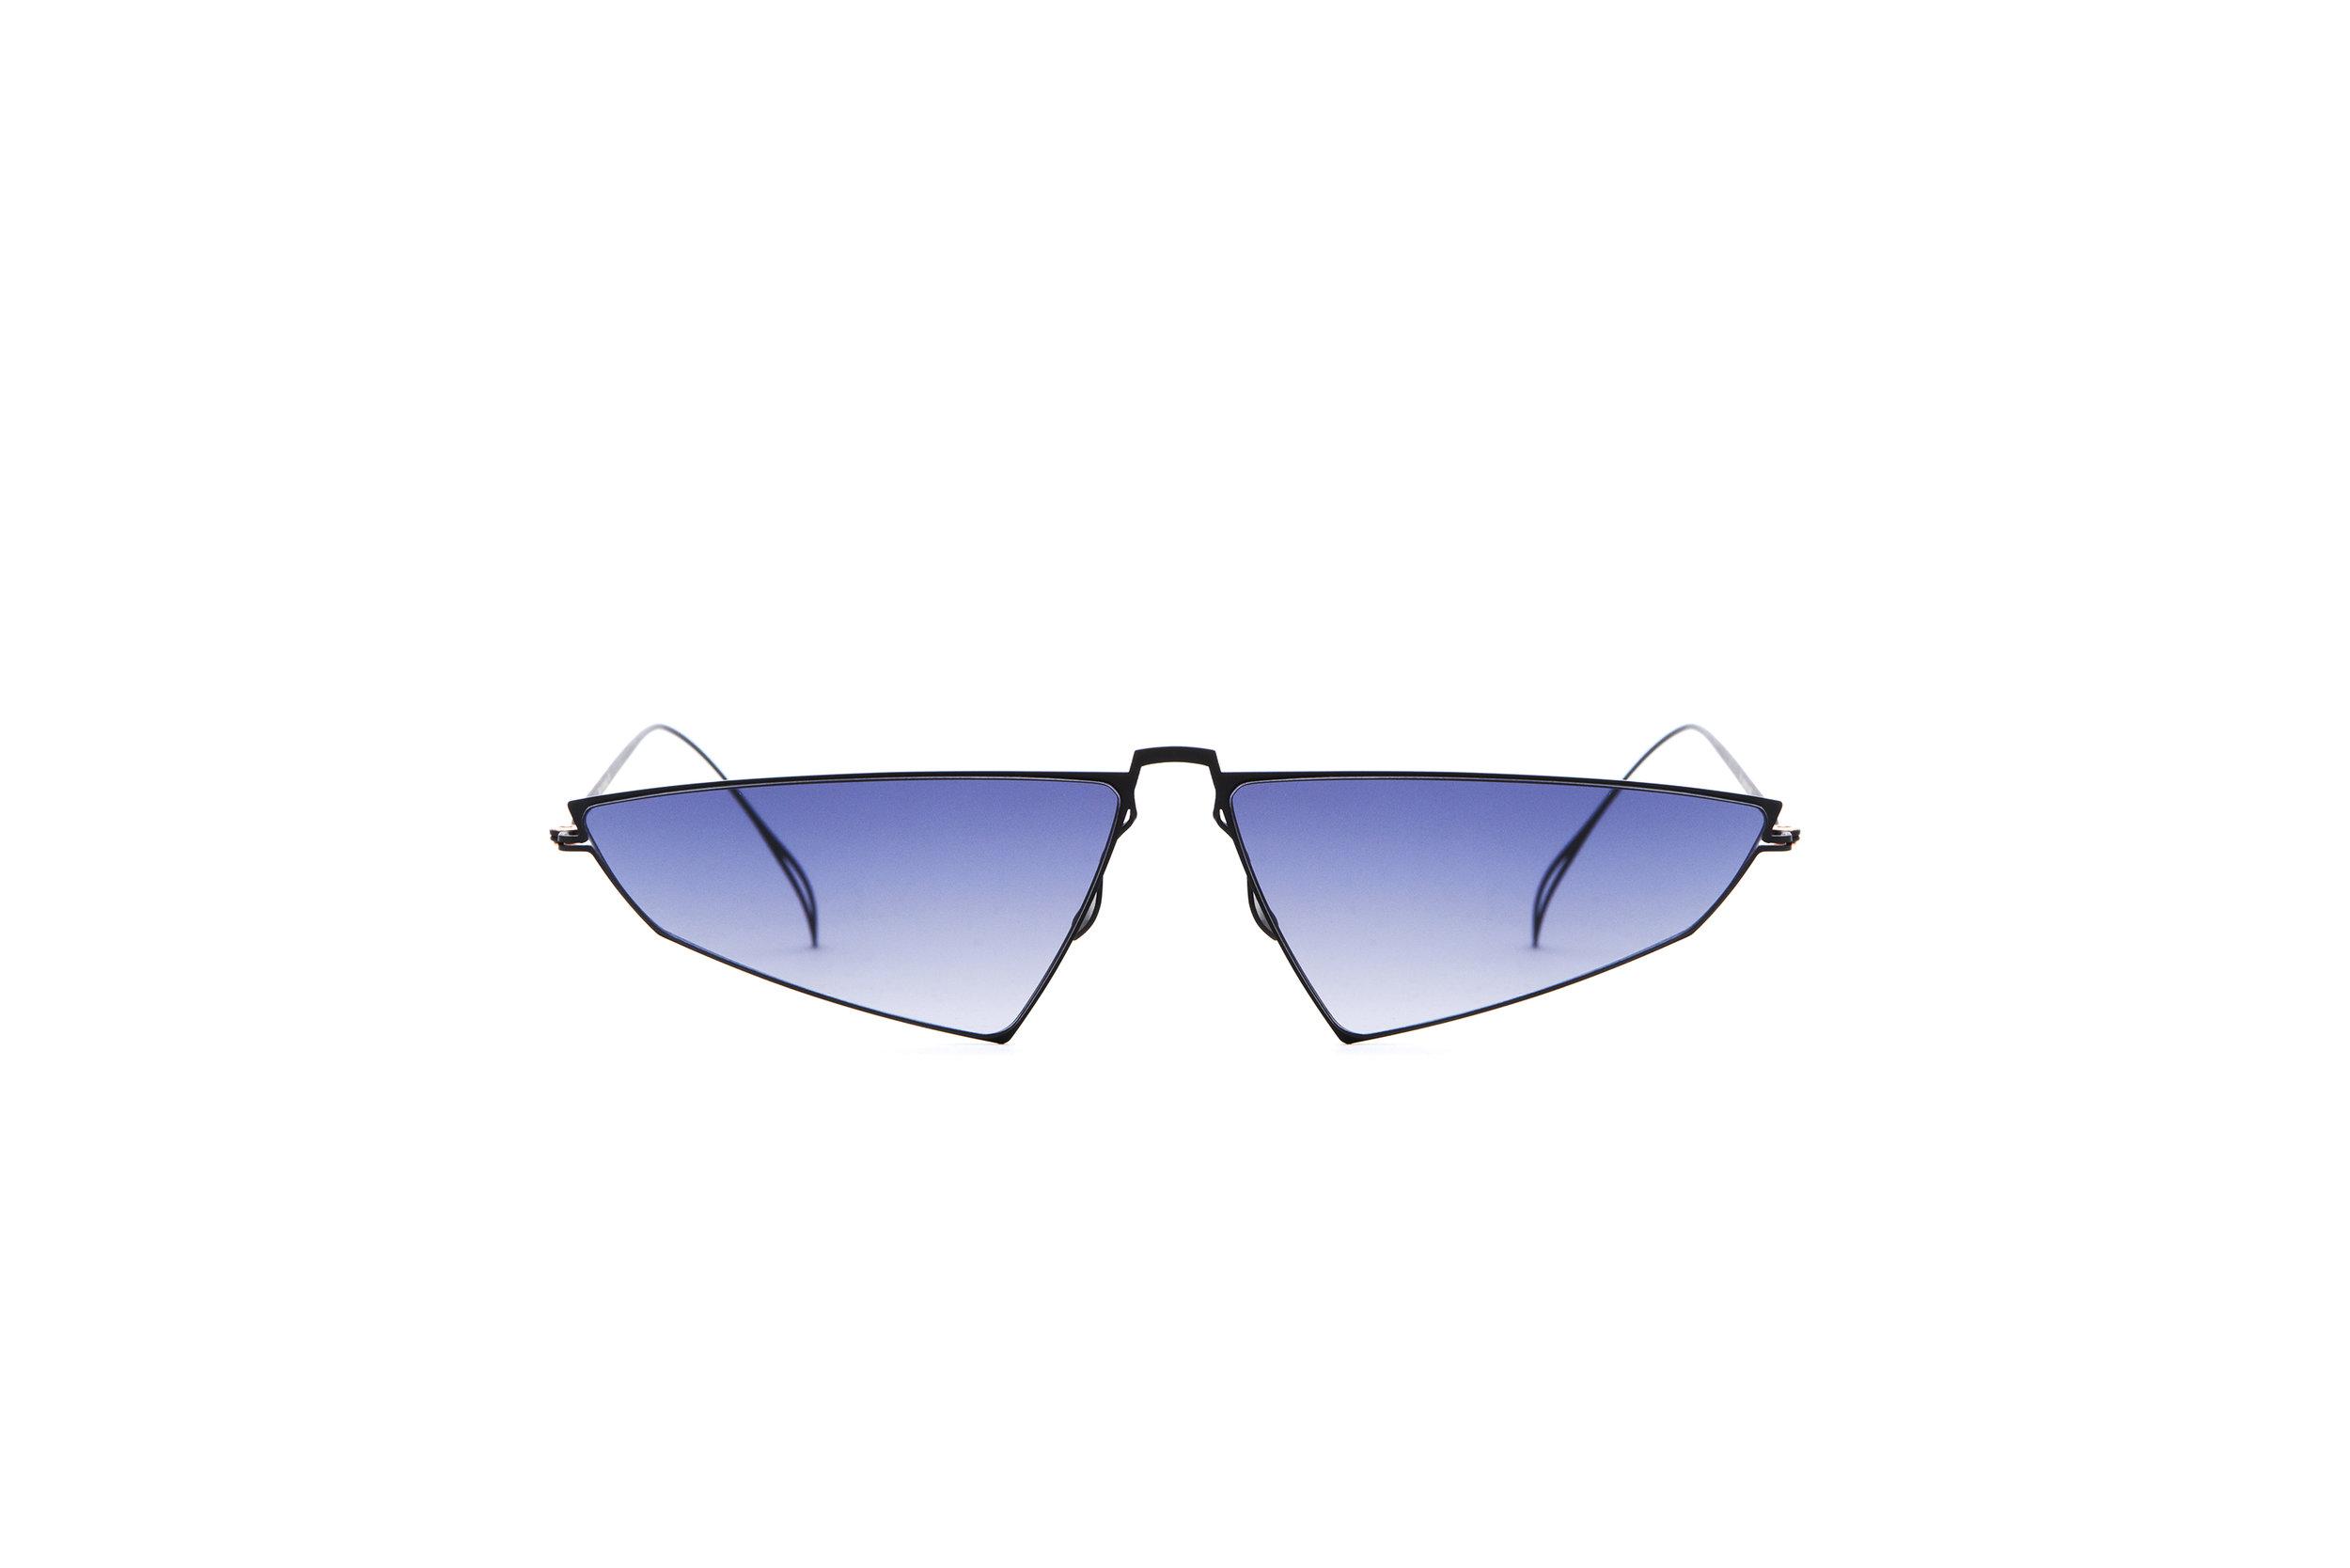 haffmans_neumeister_malaria_black_tempest_gradient_ultralight_sunglasses_front_102437.jpg